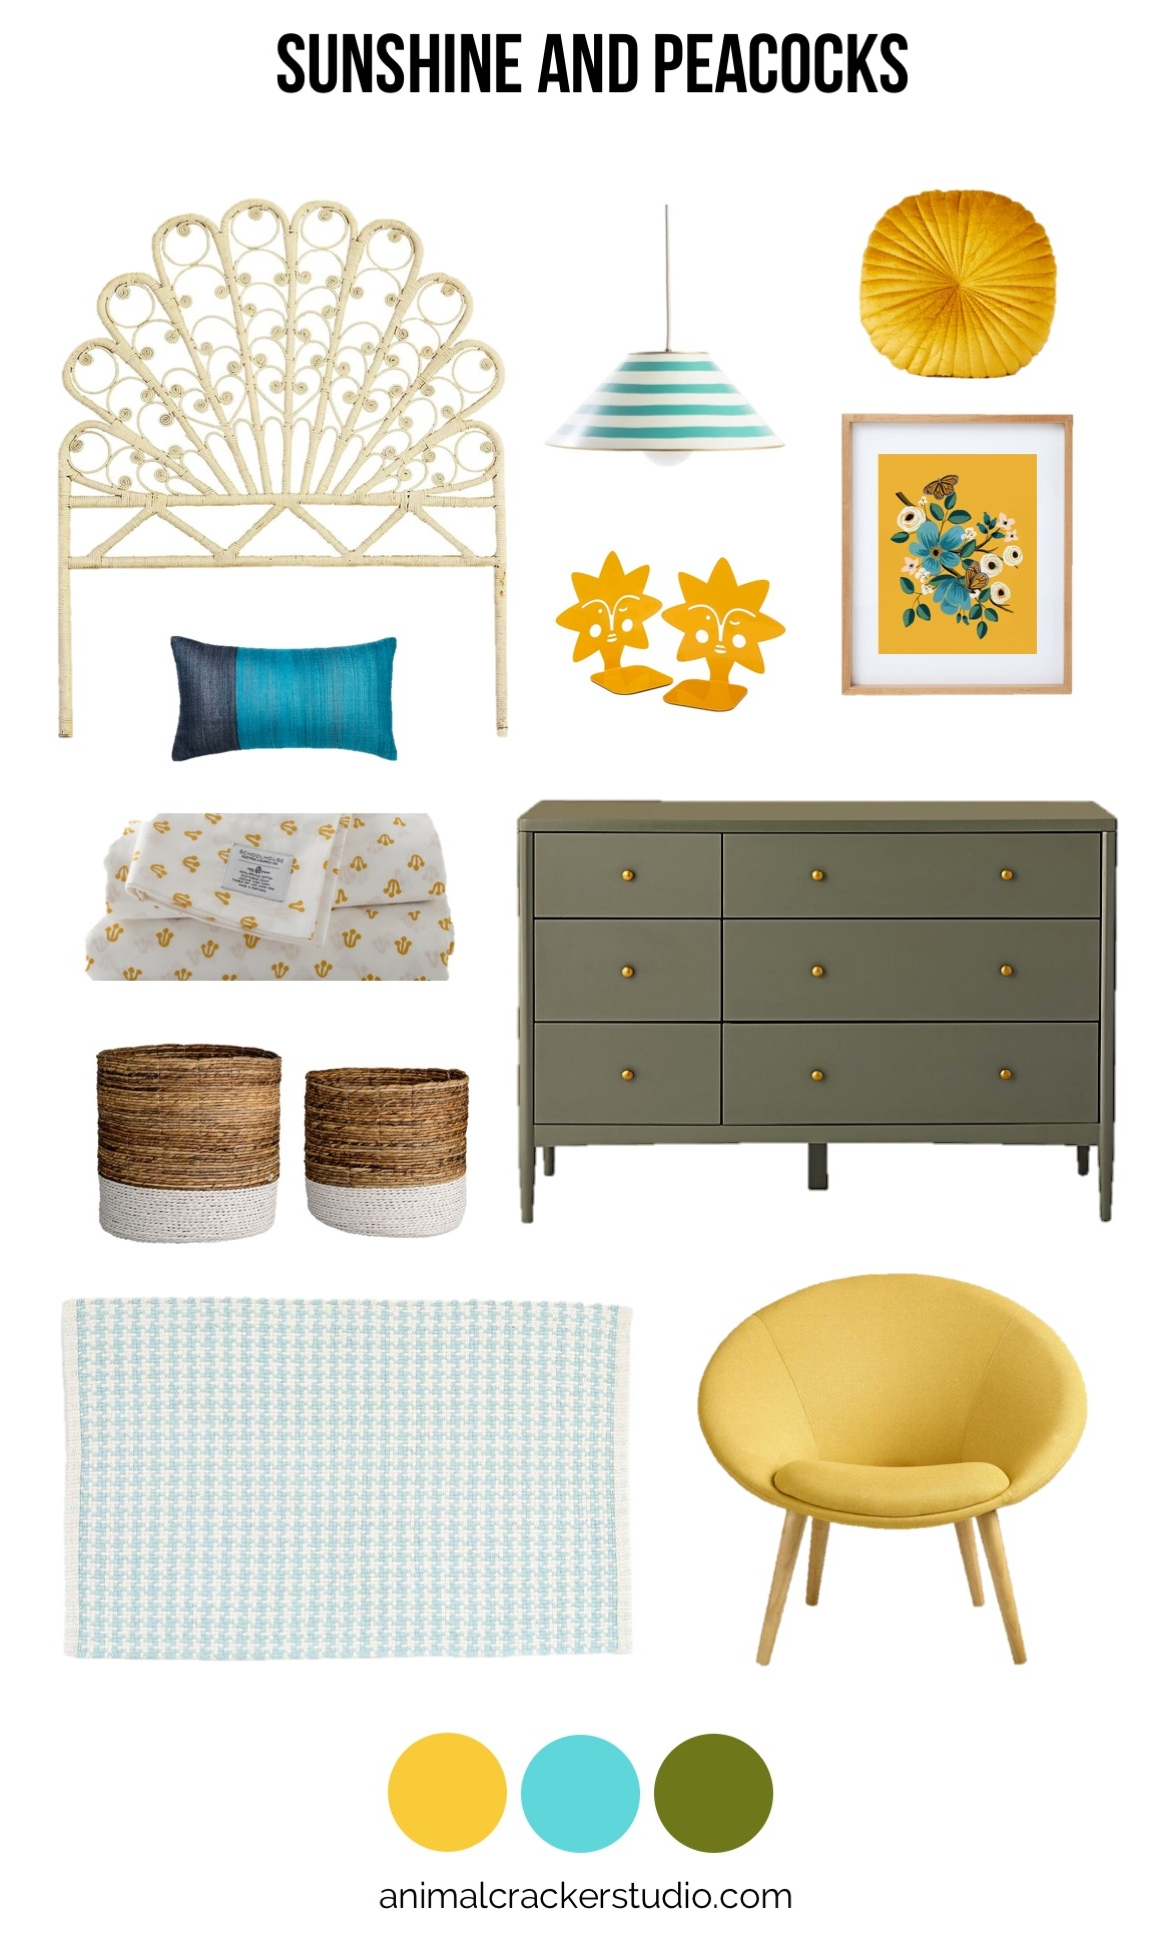 Sources:  headboard ,  pendant lamp ,  yellow pillow ,  monarch print ,  frame ,  bookends ,  dresser ,  chair ,  rug ,  baskets ,  sheets ,  silk throw pillow .